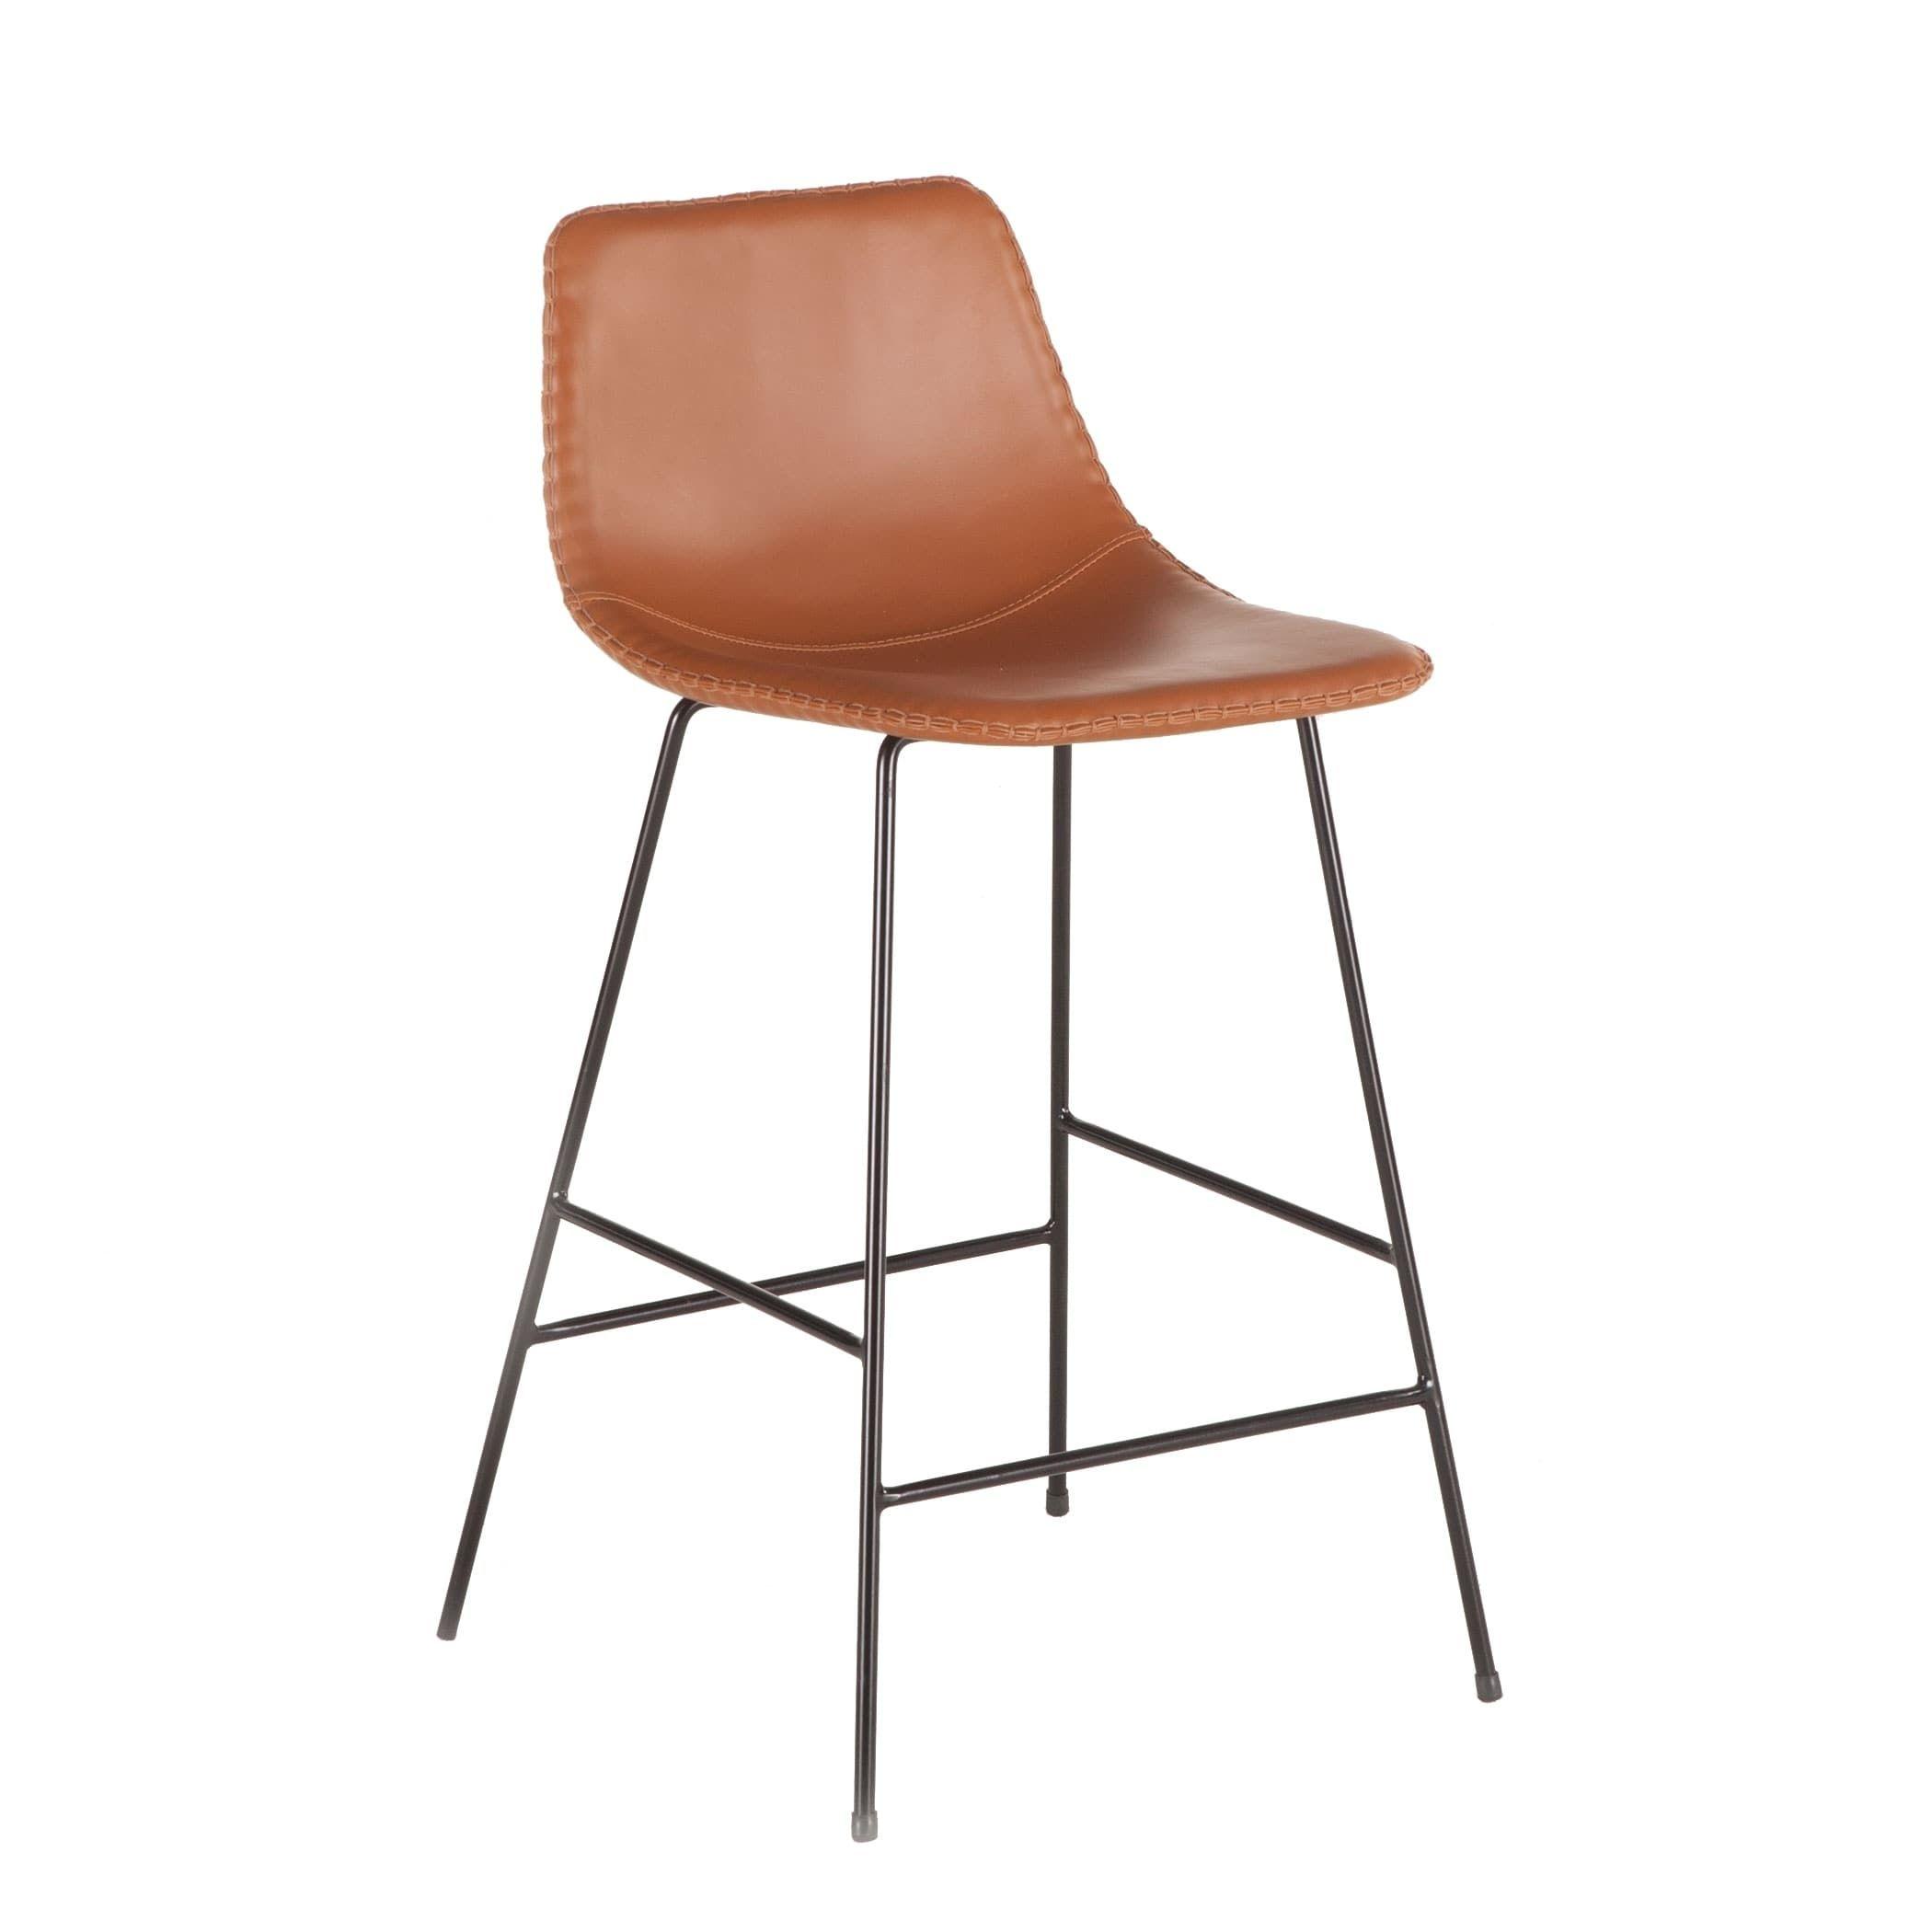 Marvelous Tan Faux Leather Counter Height Stool By World Interiors Inzonedesignstudio Interior Chair Design Inzonedesignstudiocom